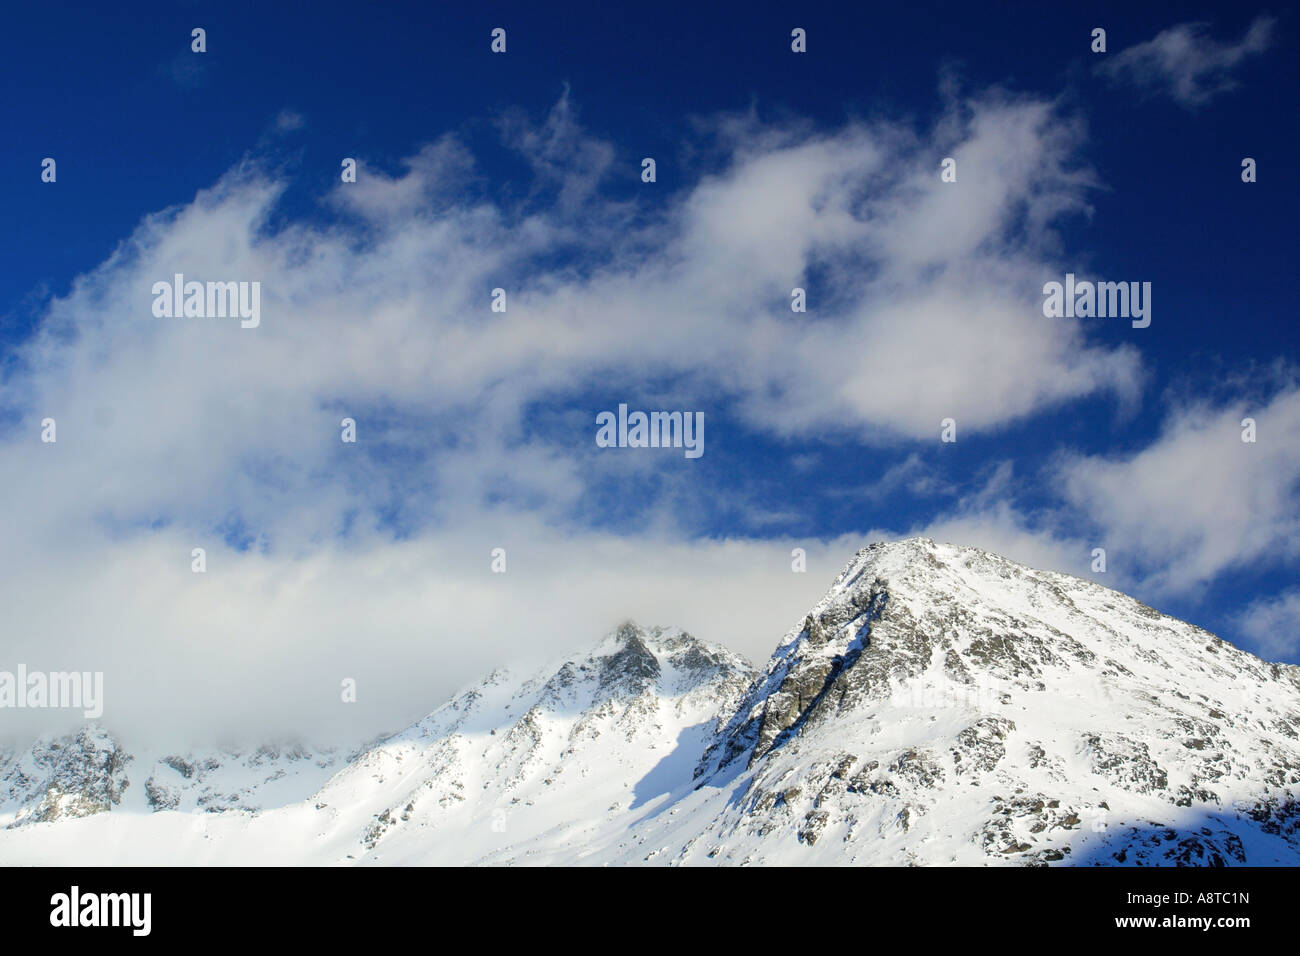 Valais Alps, view from Arolla valley, Switzerland Stock Photo